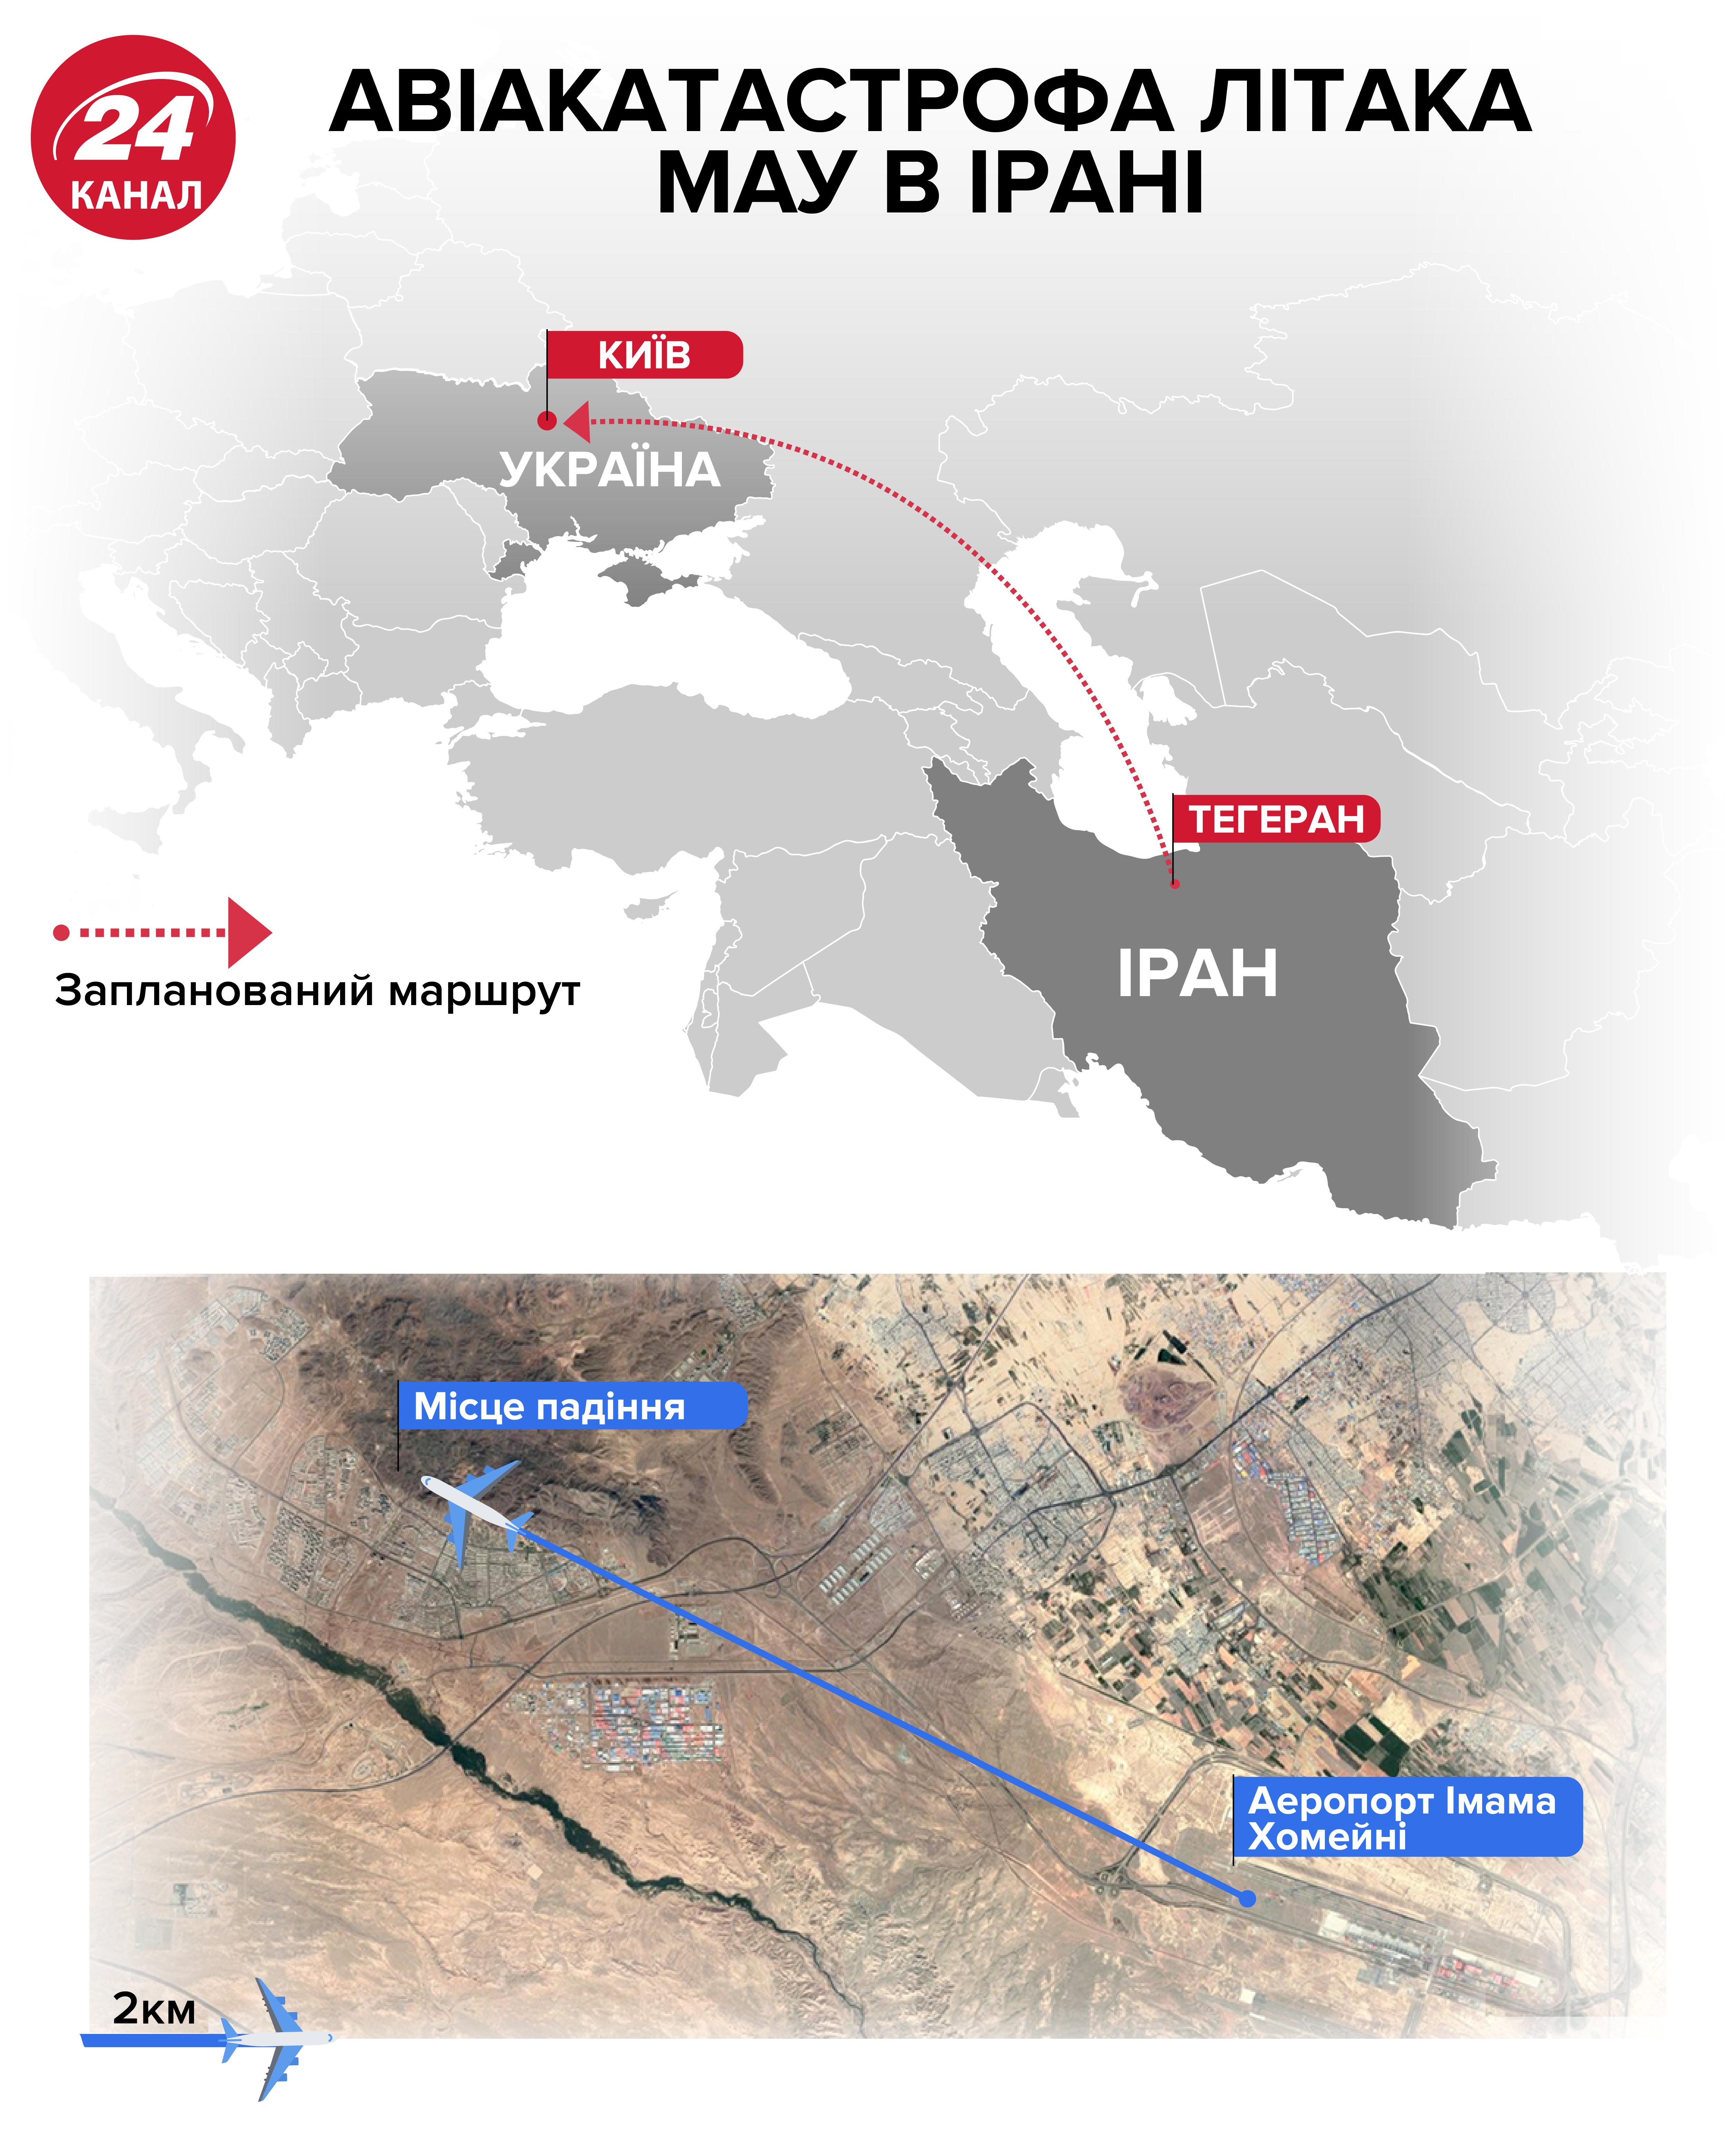 місце збиття літака МАУ карта падіння літака МАУ Іран